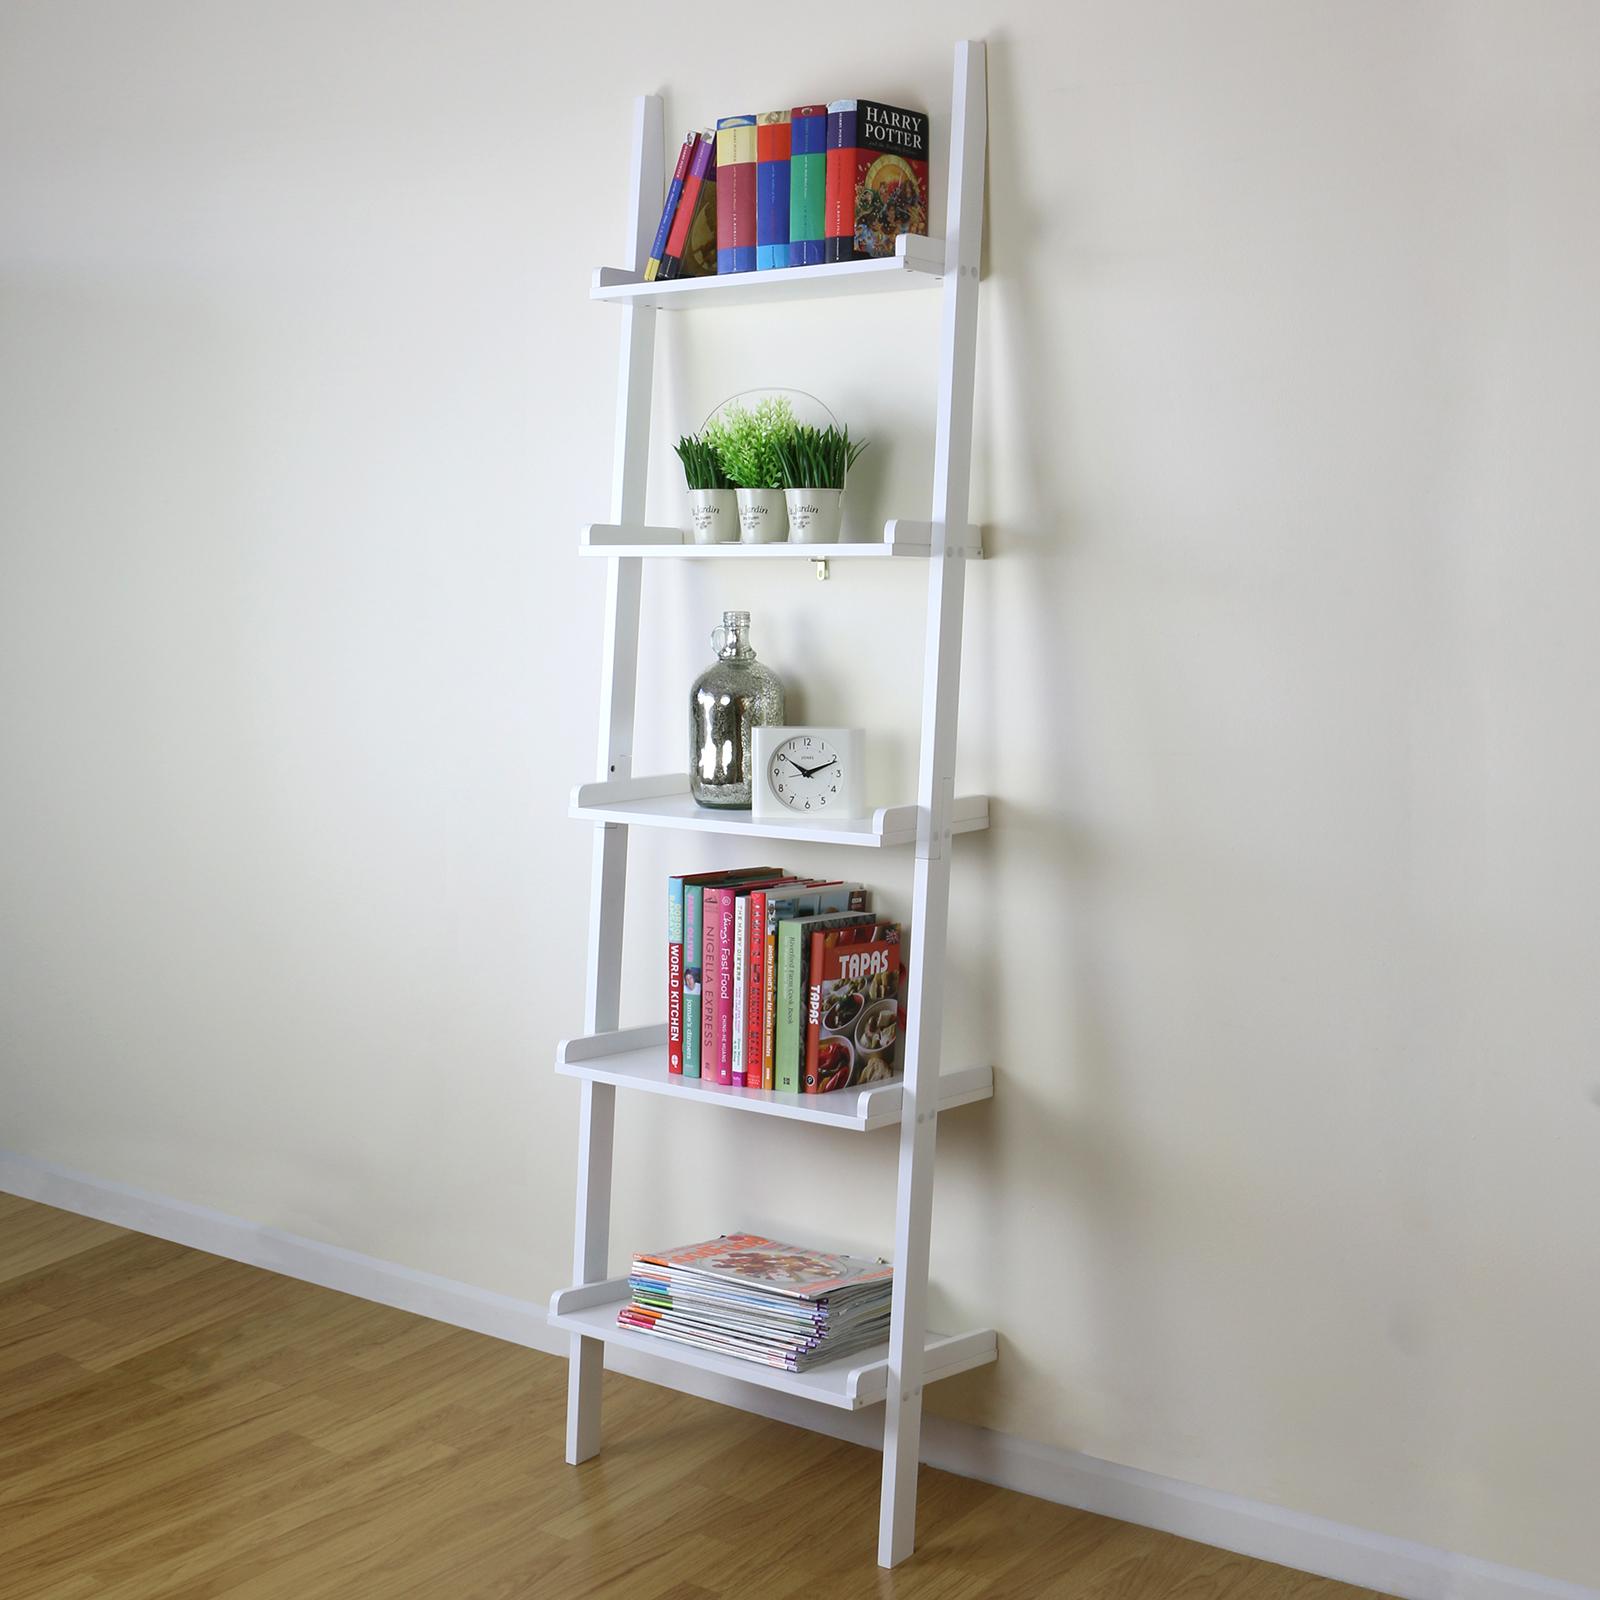 5 Tier White Ladder Wall Shelf Home Storage/Display Unit ...